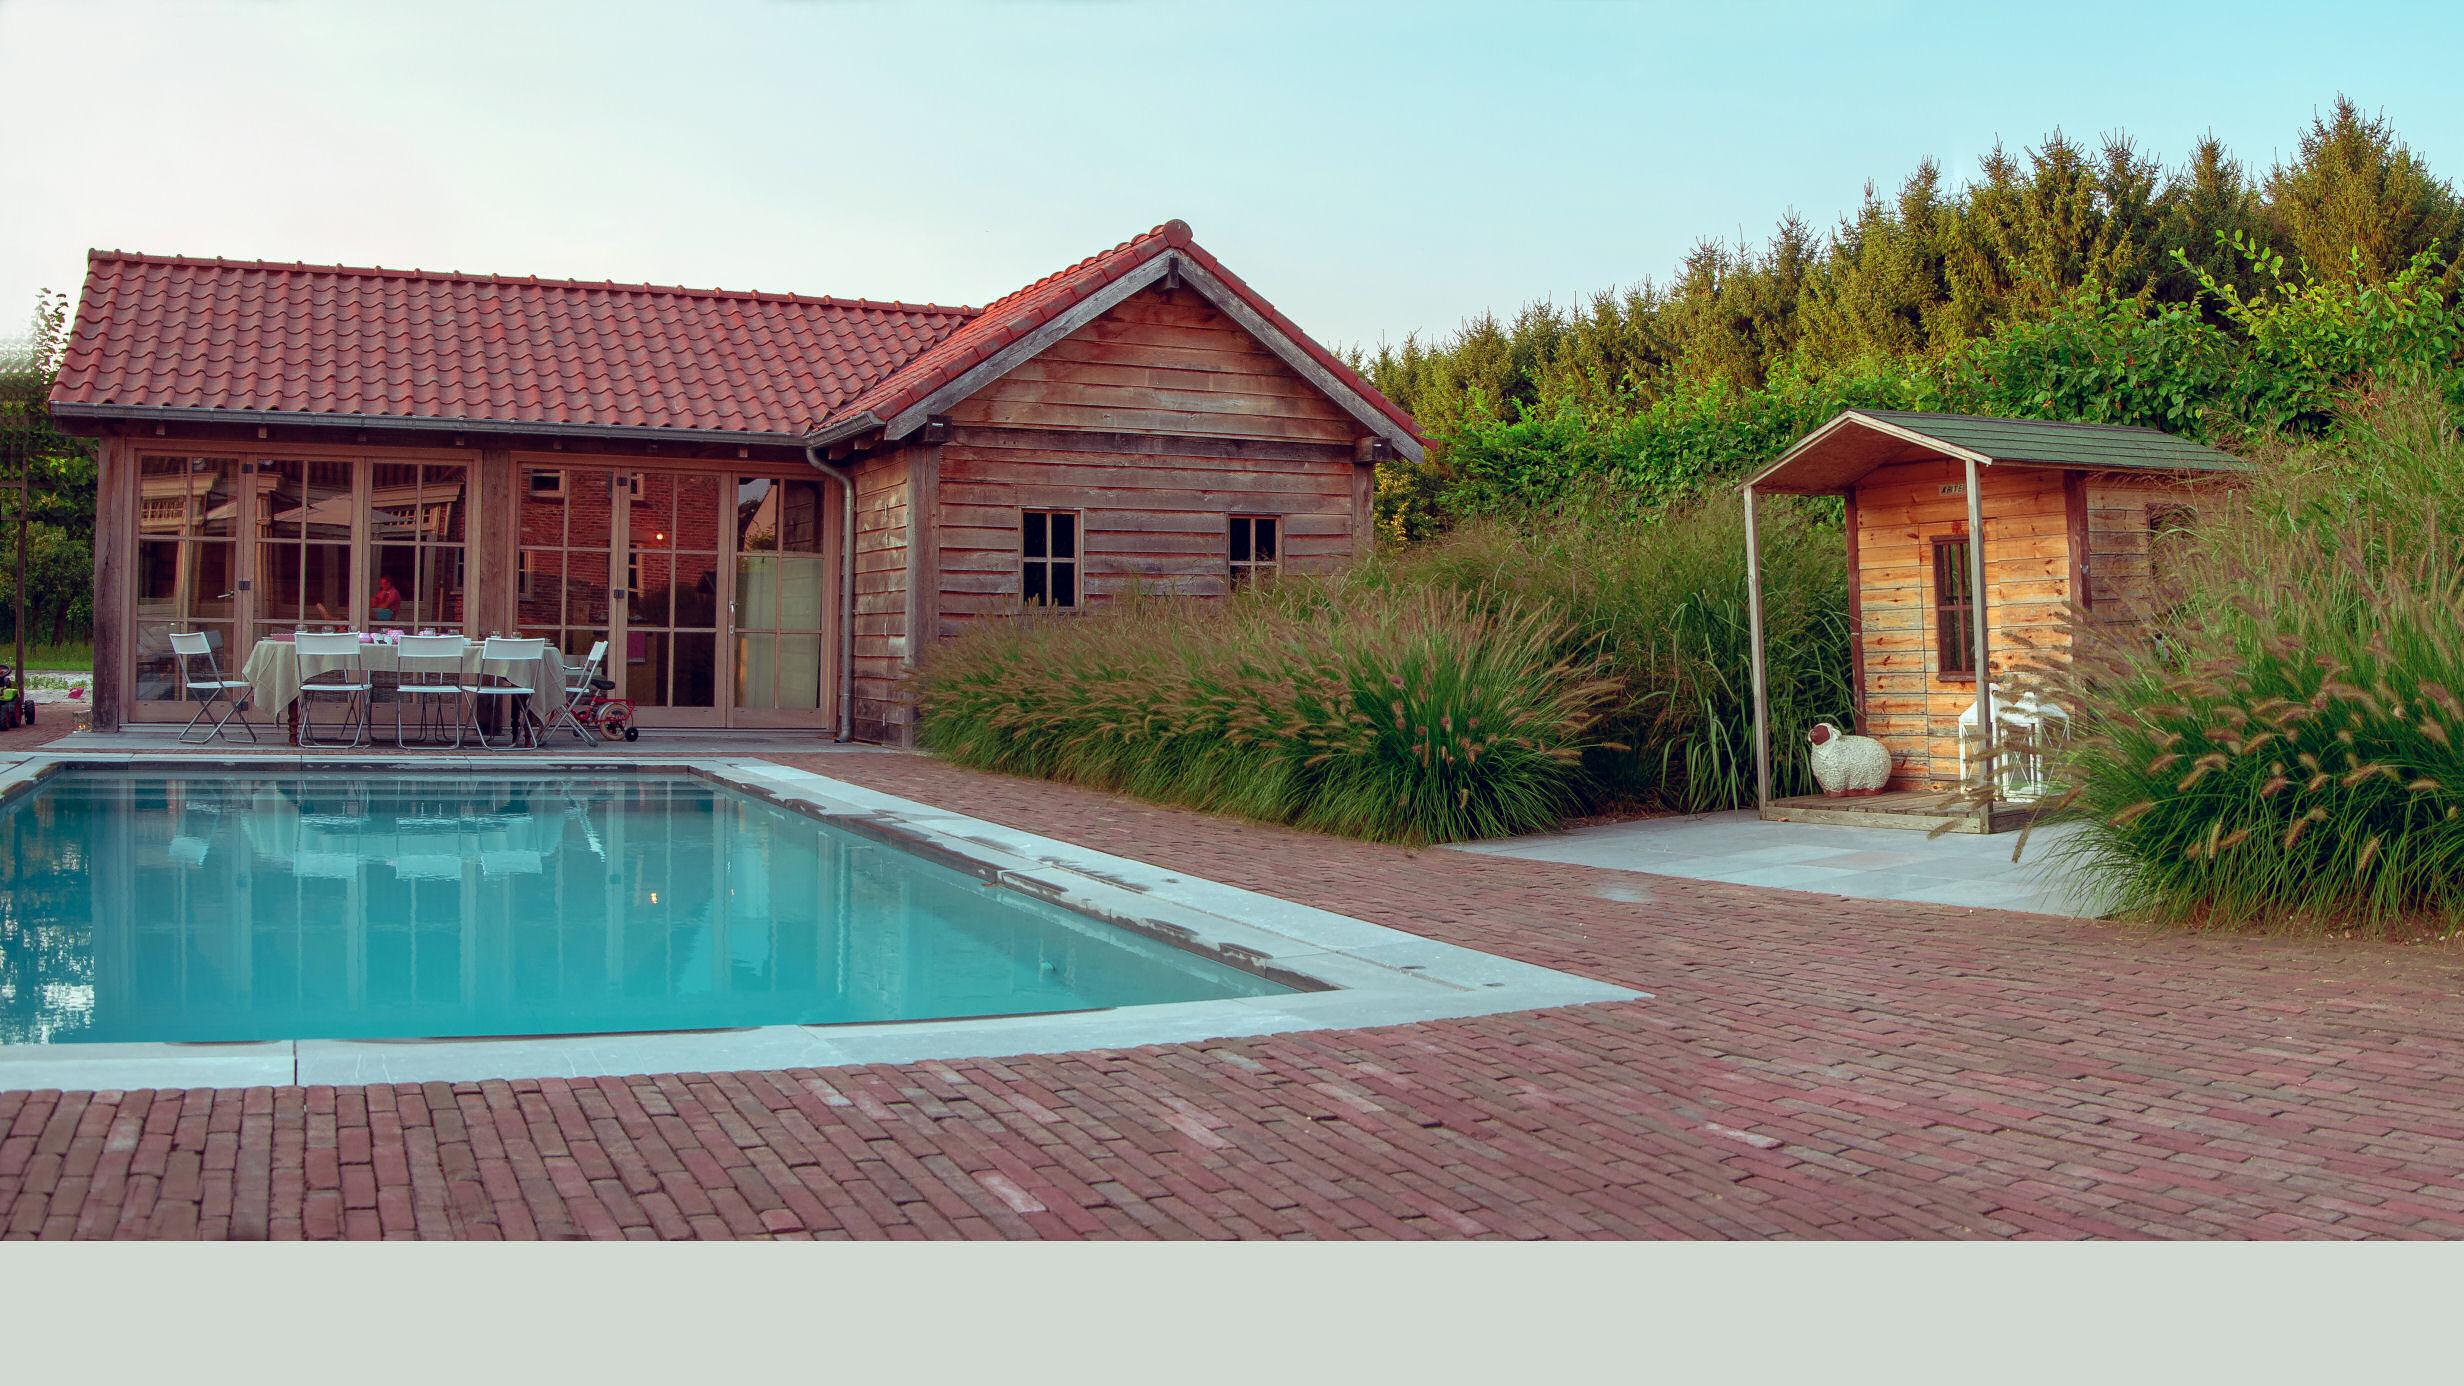 tuinontwerp, tuinaanleg, zwembad, poolhouse, tuinaannemer